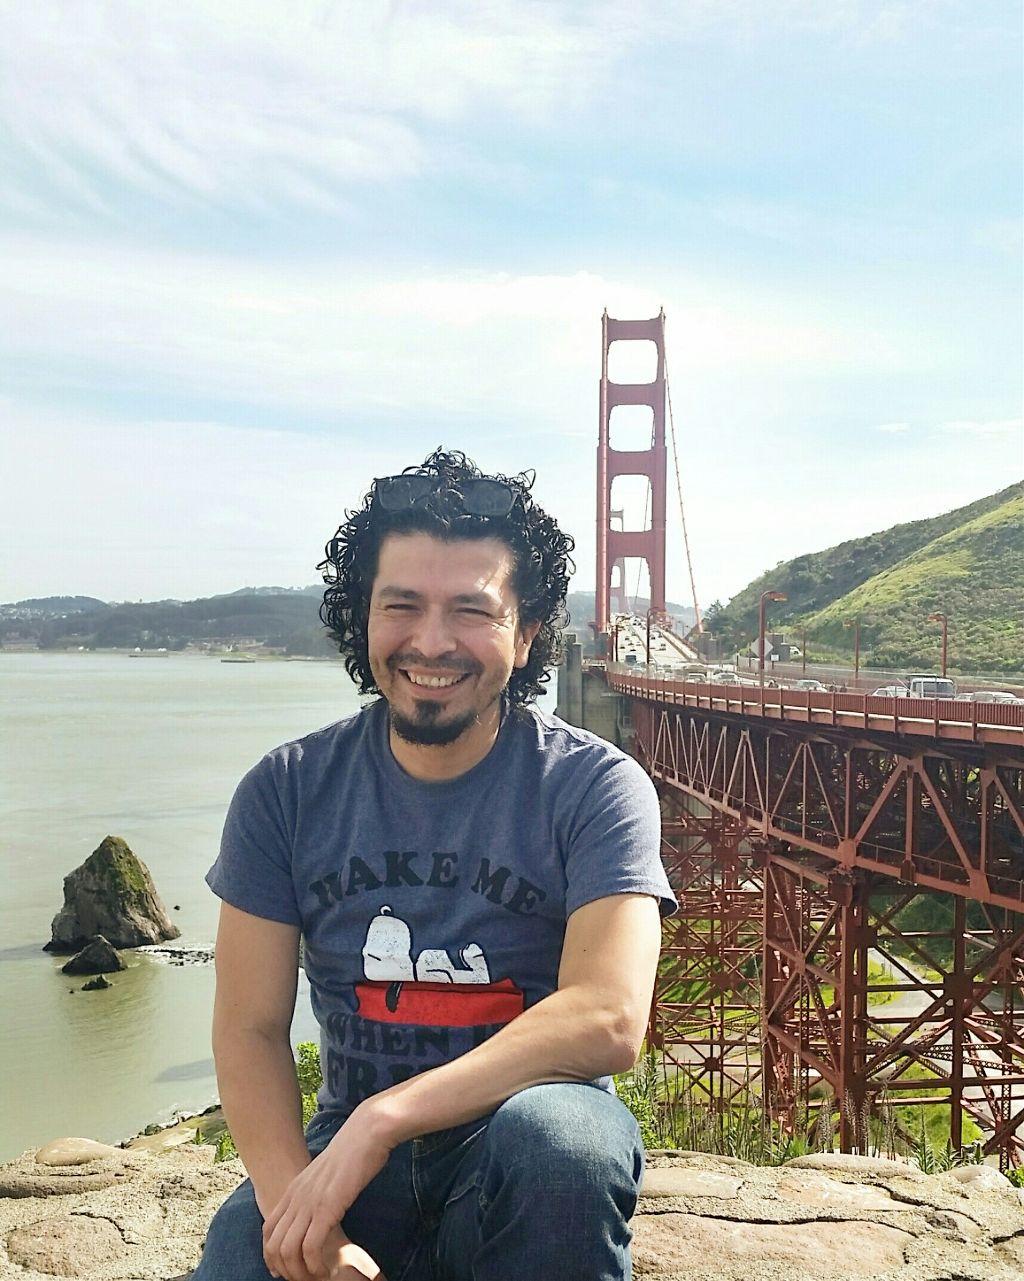 San Francisco. #FreeToEdit #bridge #goldengatebridge #latino #selfie #interesting #photography #singlelife